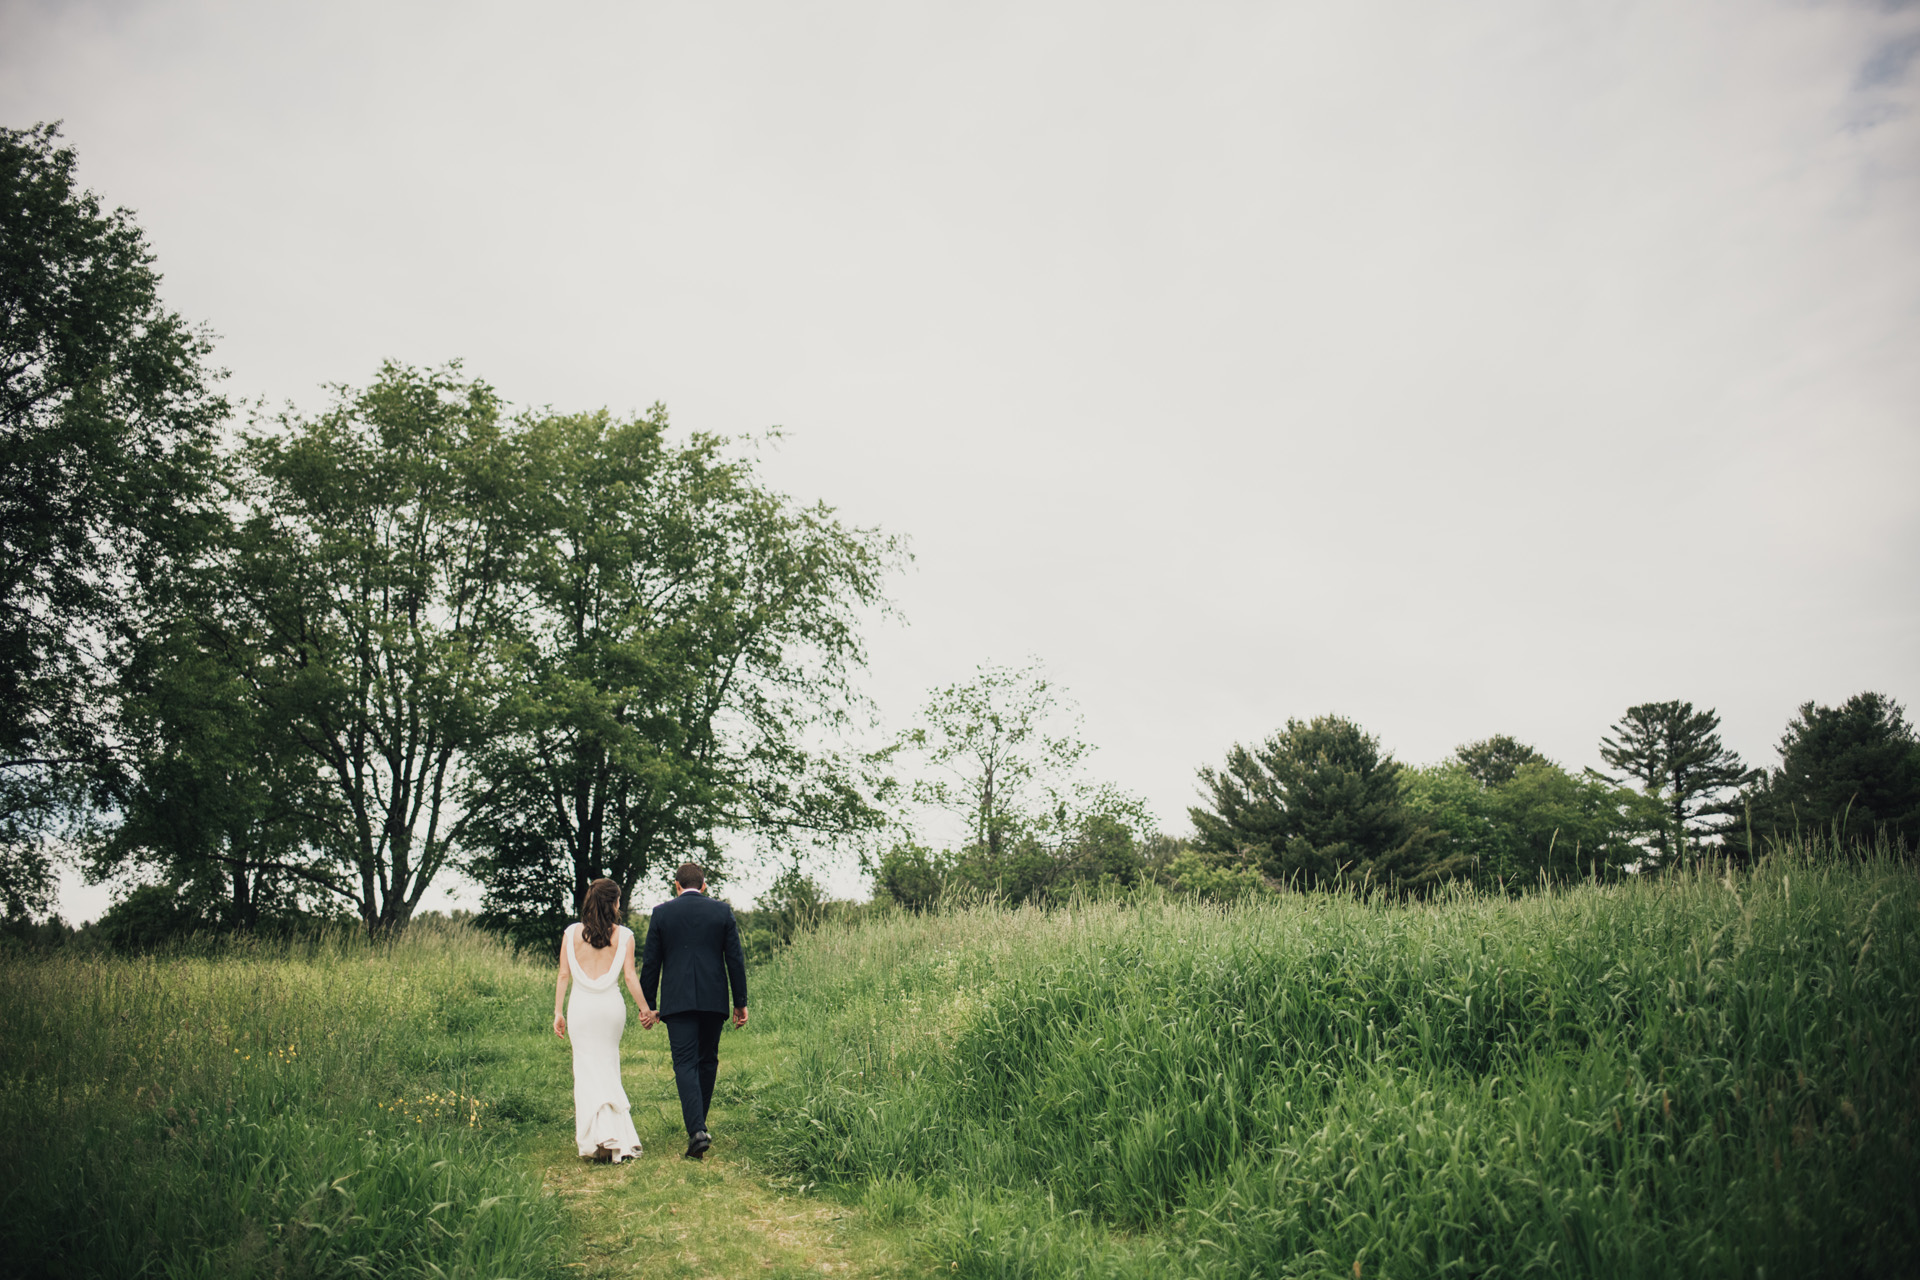 gedney-farm-wedding-photographer-47